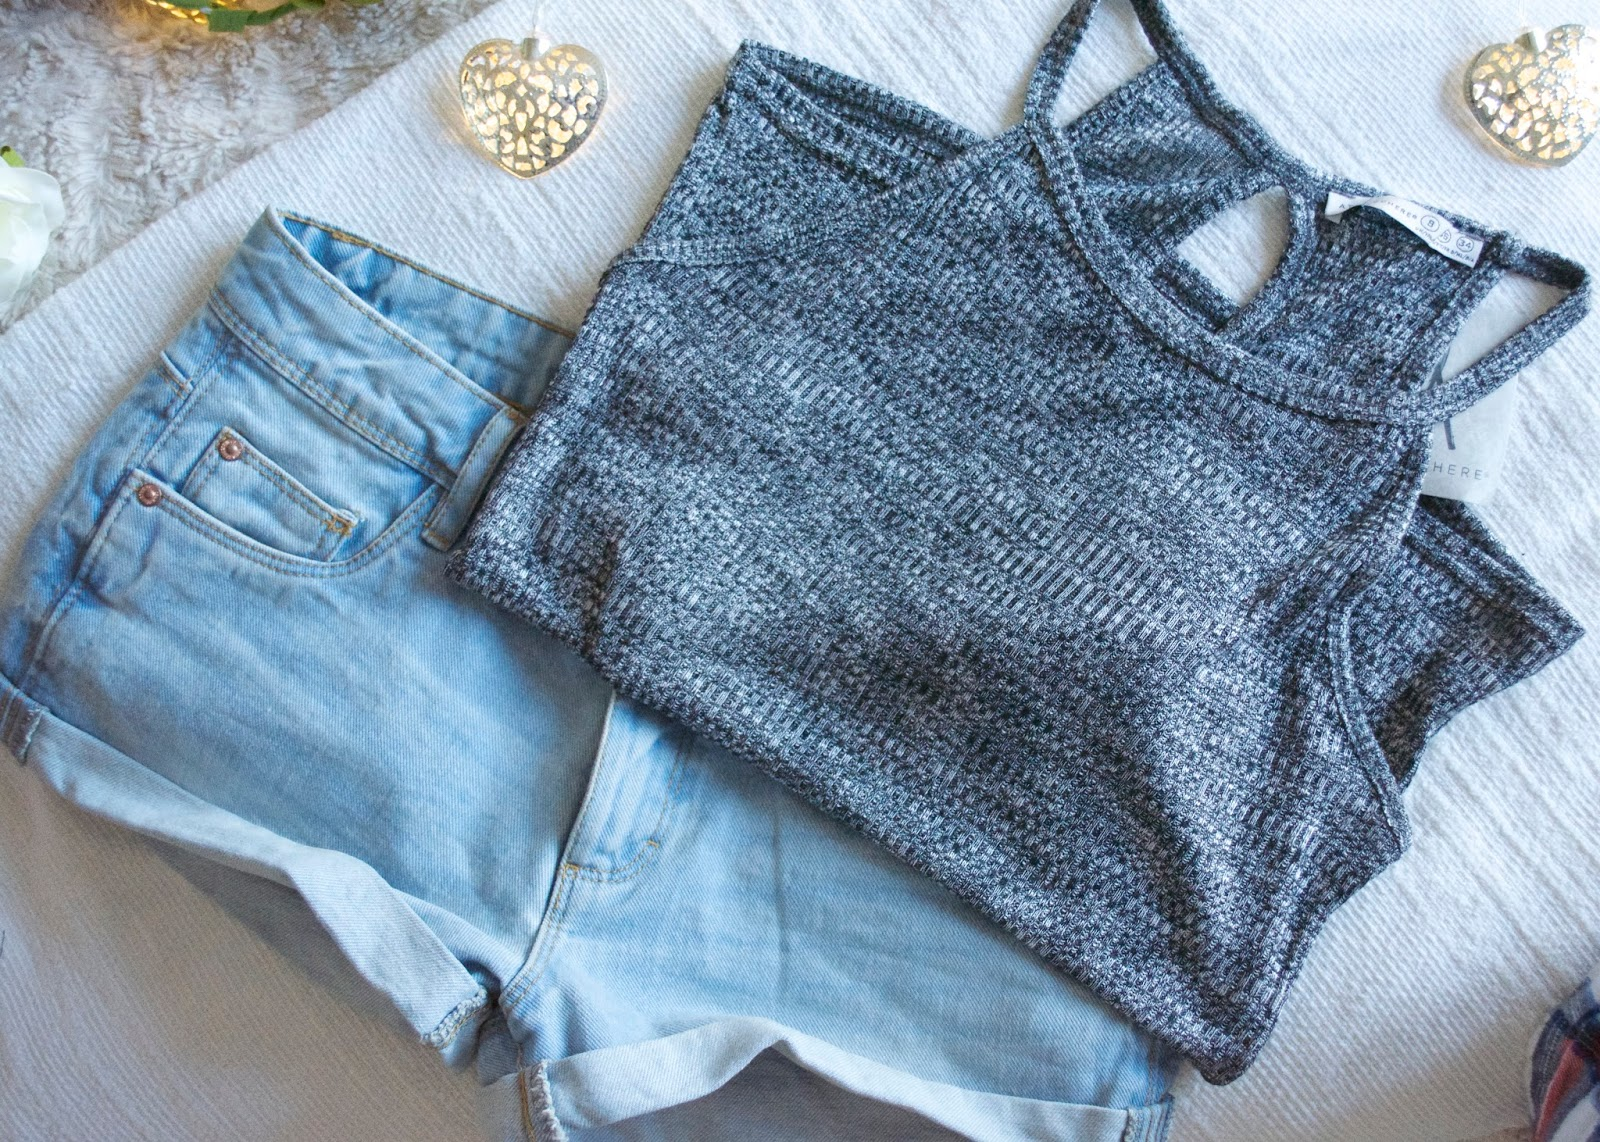 Primark Haul, Primark Denim Shorts, Denim Shorts, Knitted Grey Top, Primark